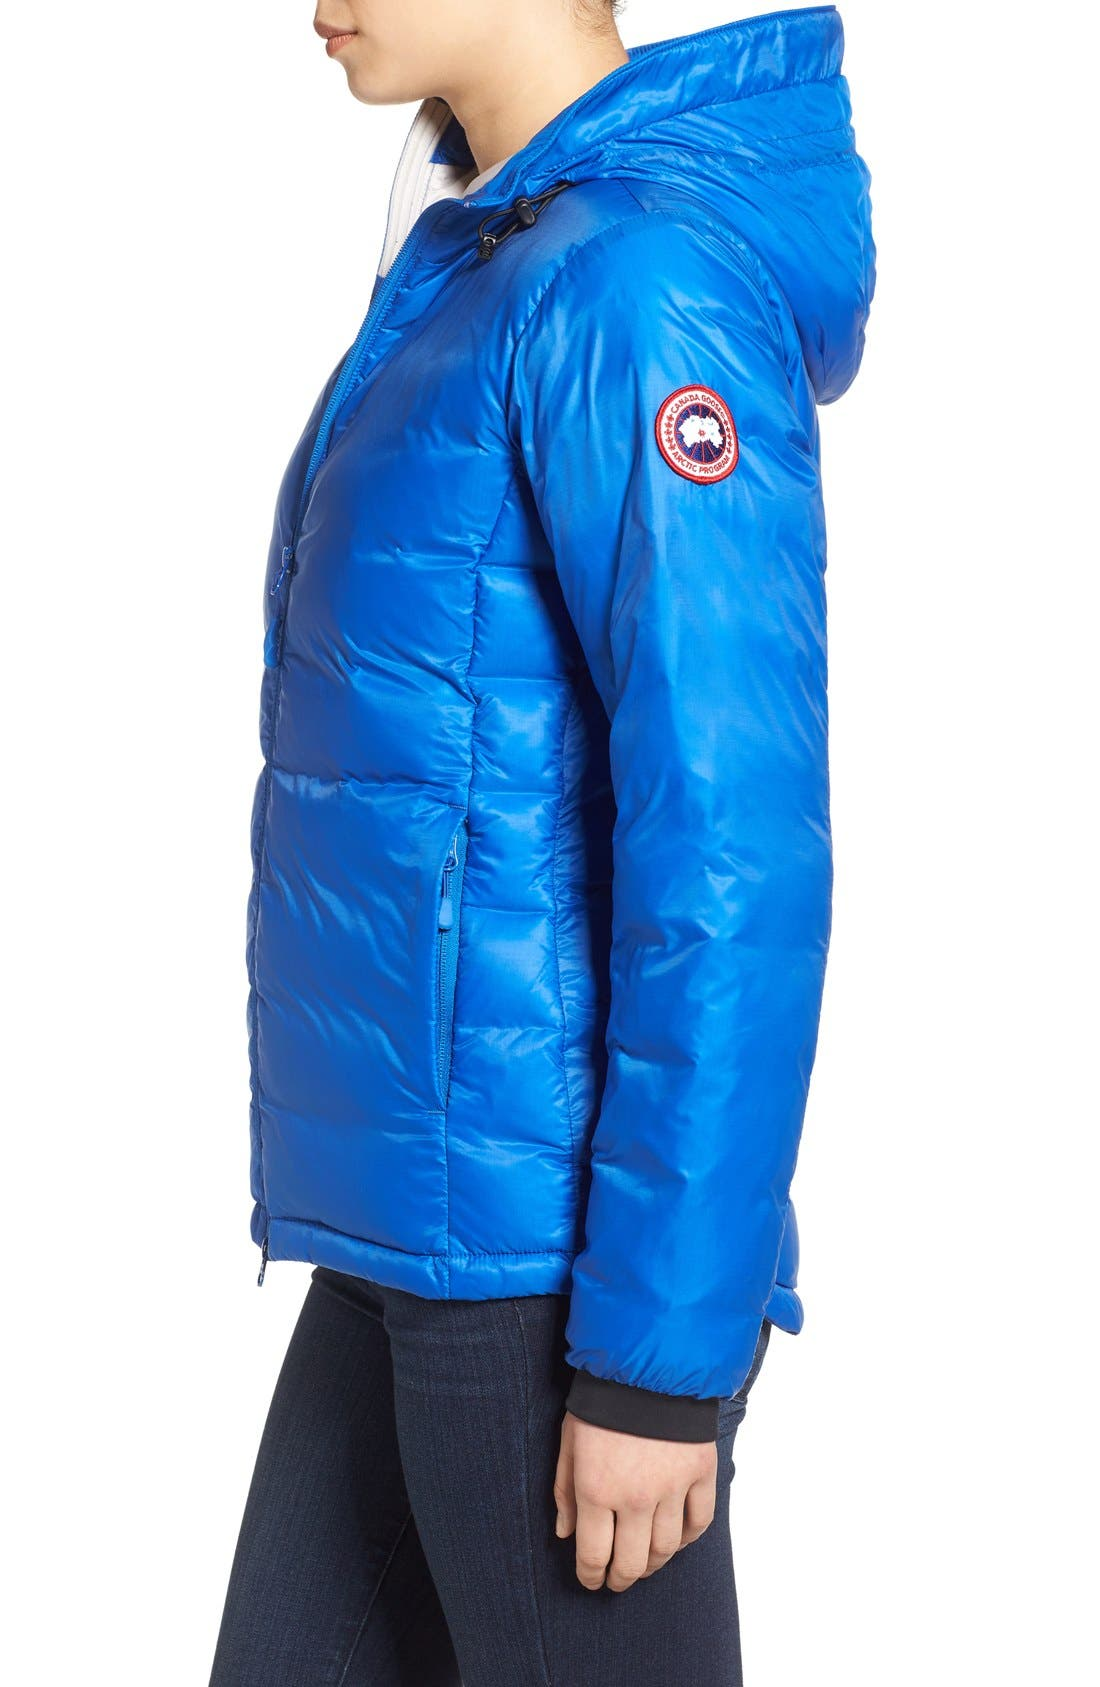 'PBI Camp' Packable Hooded Down Jacket,                             Alternate thumbnail 6, color,                             ROYAL PBI BLUE